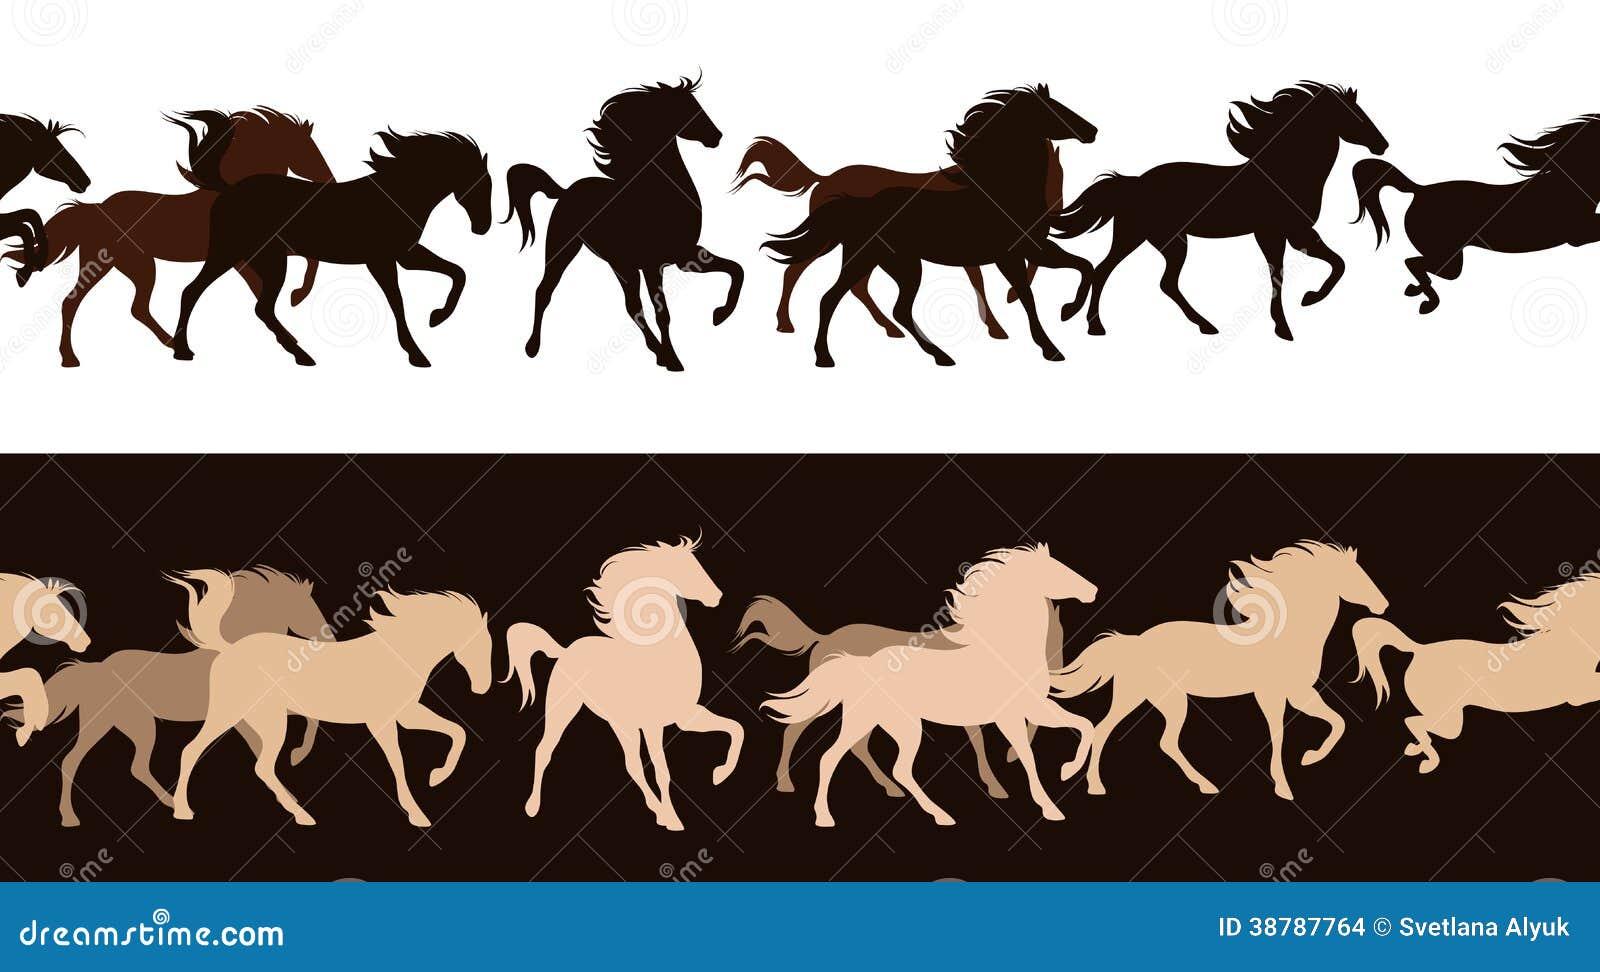 Horse herd vector stock vector. Illustration of design ...